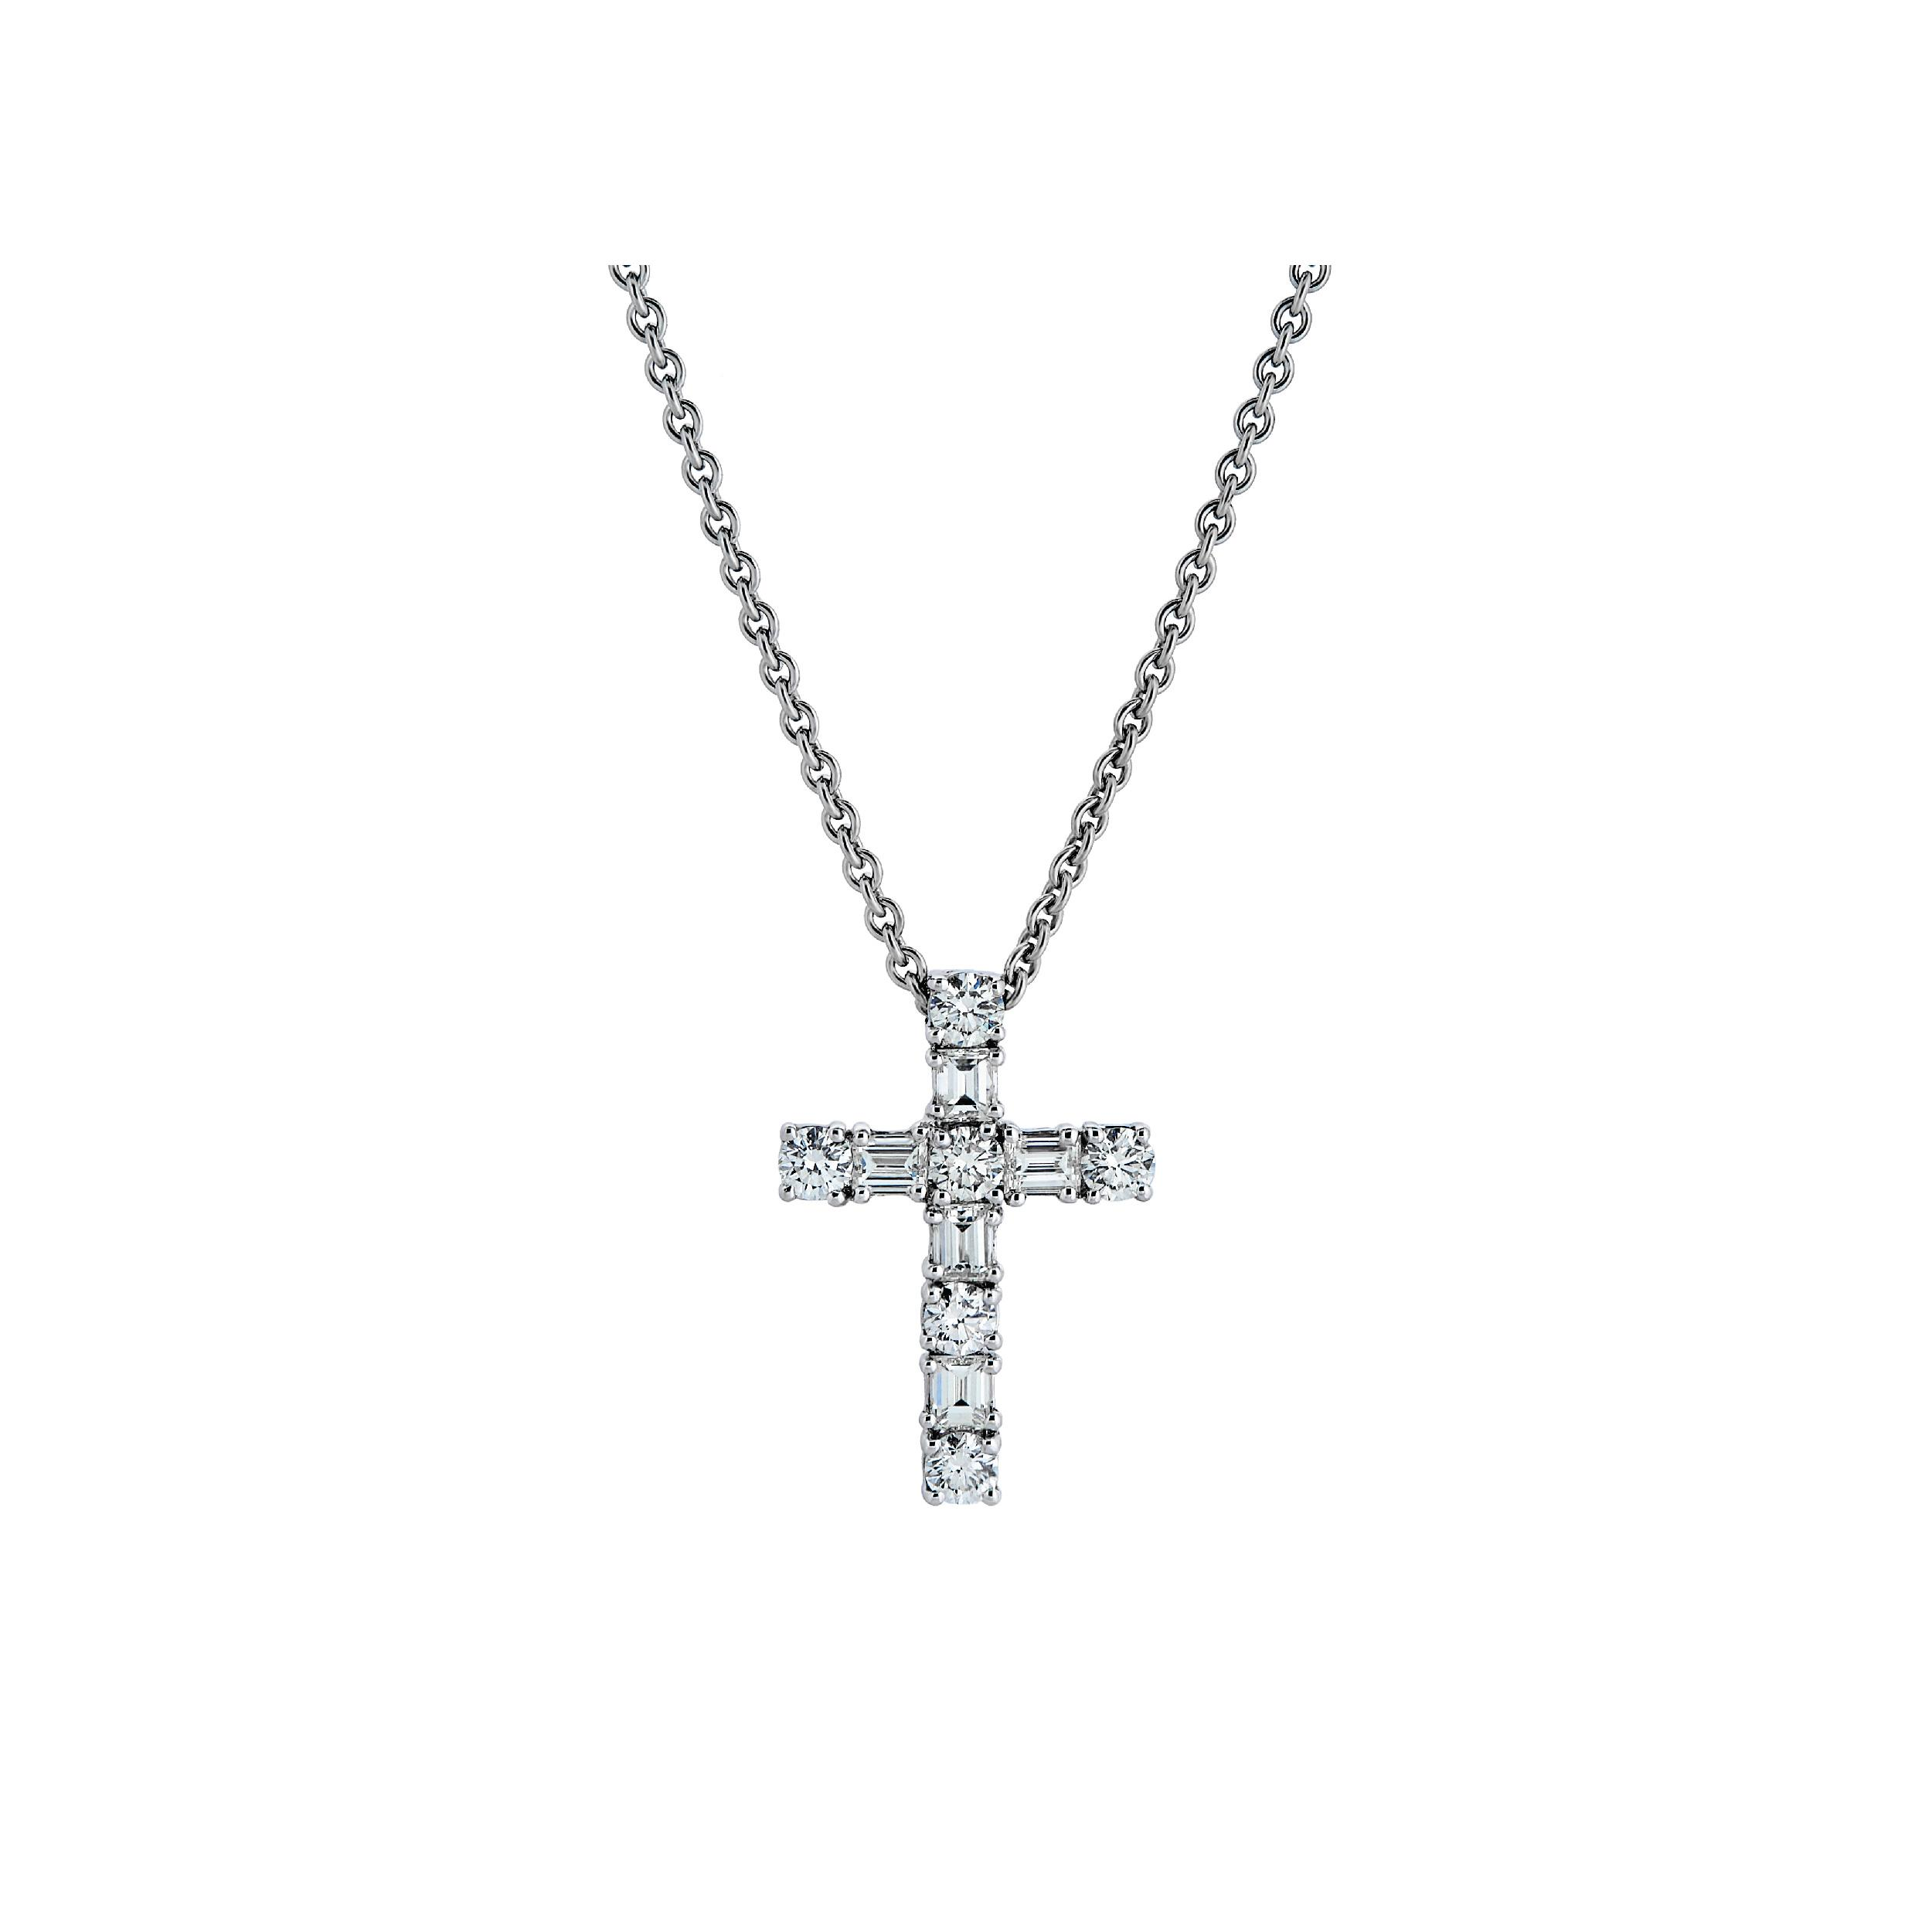 CHATE Крестик с бриллиантами